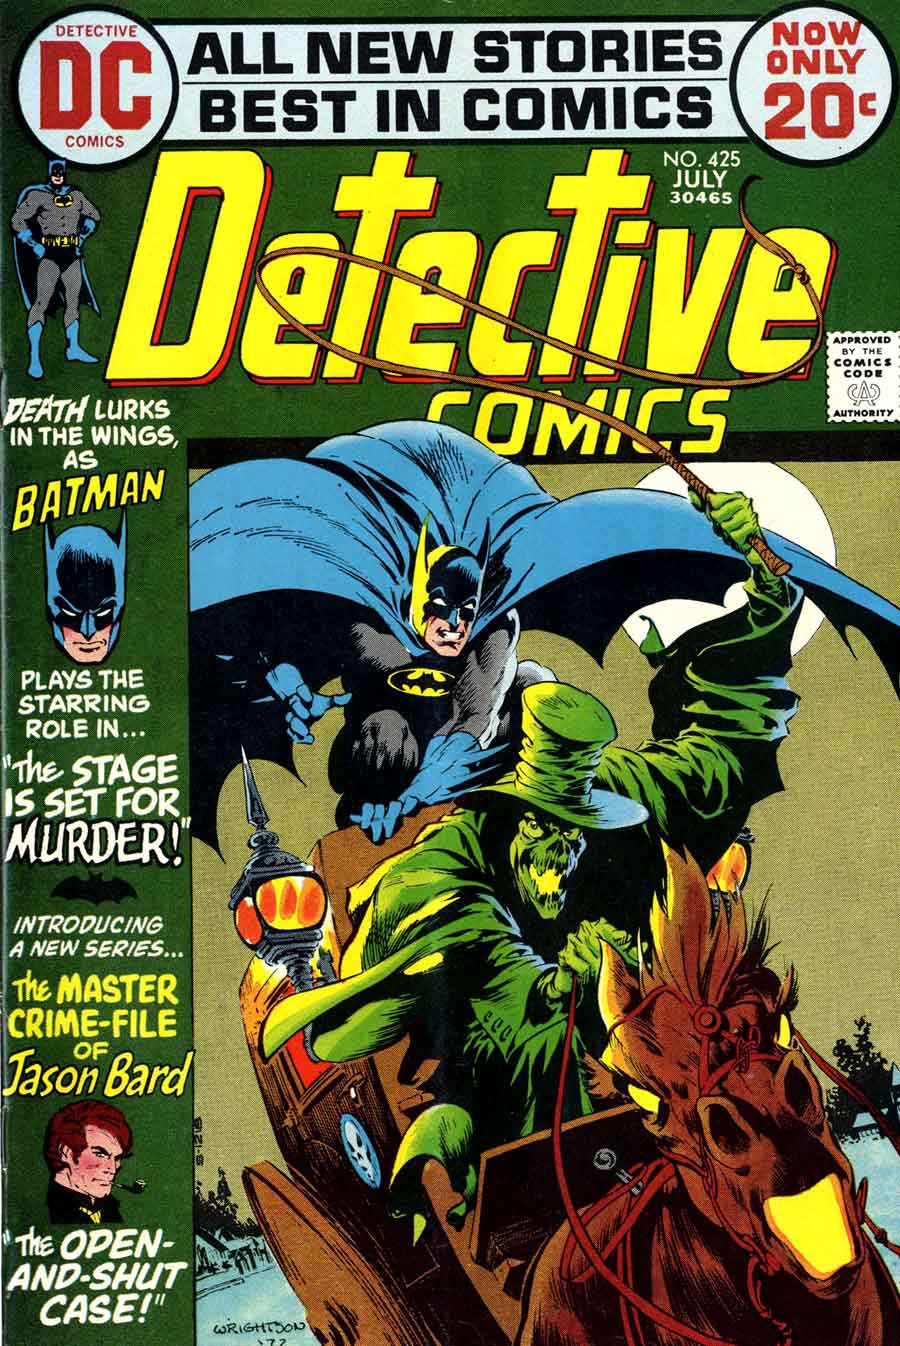 Detective Comics #425 dc Batman comic book cover art by Bernie Wrightson